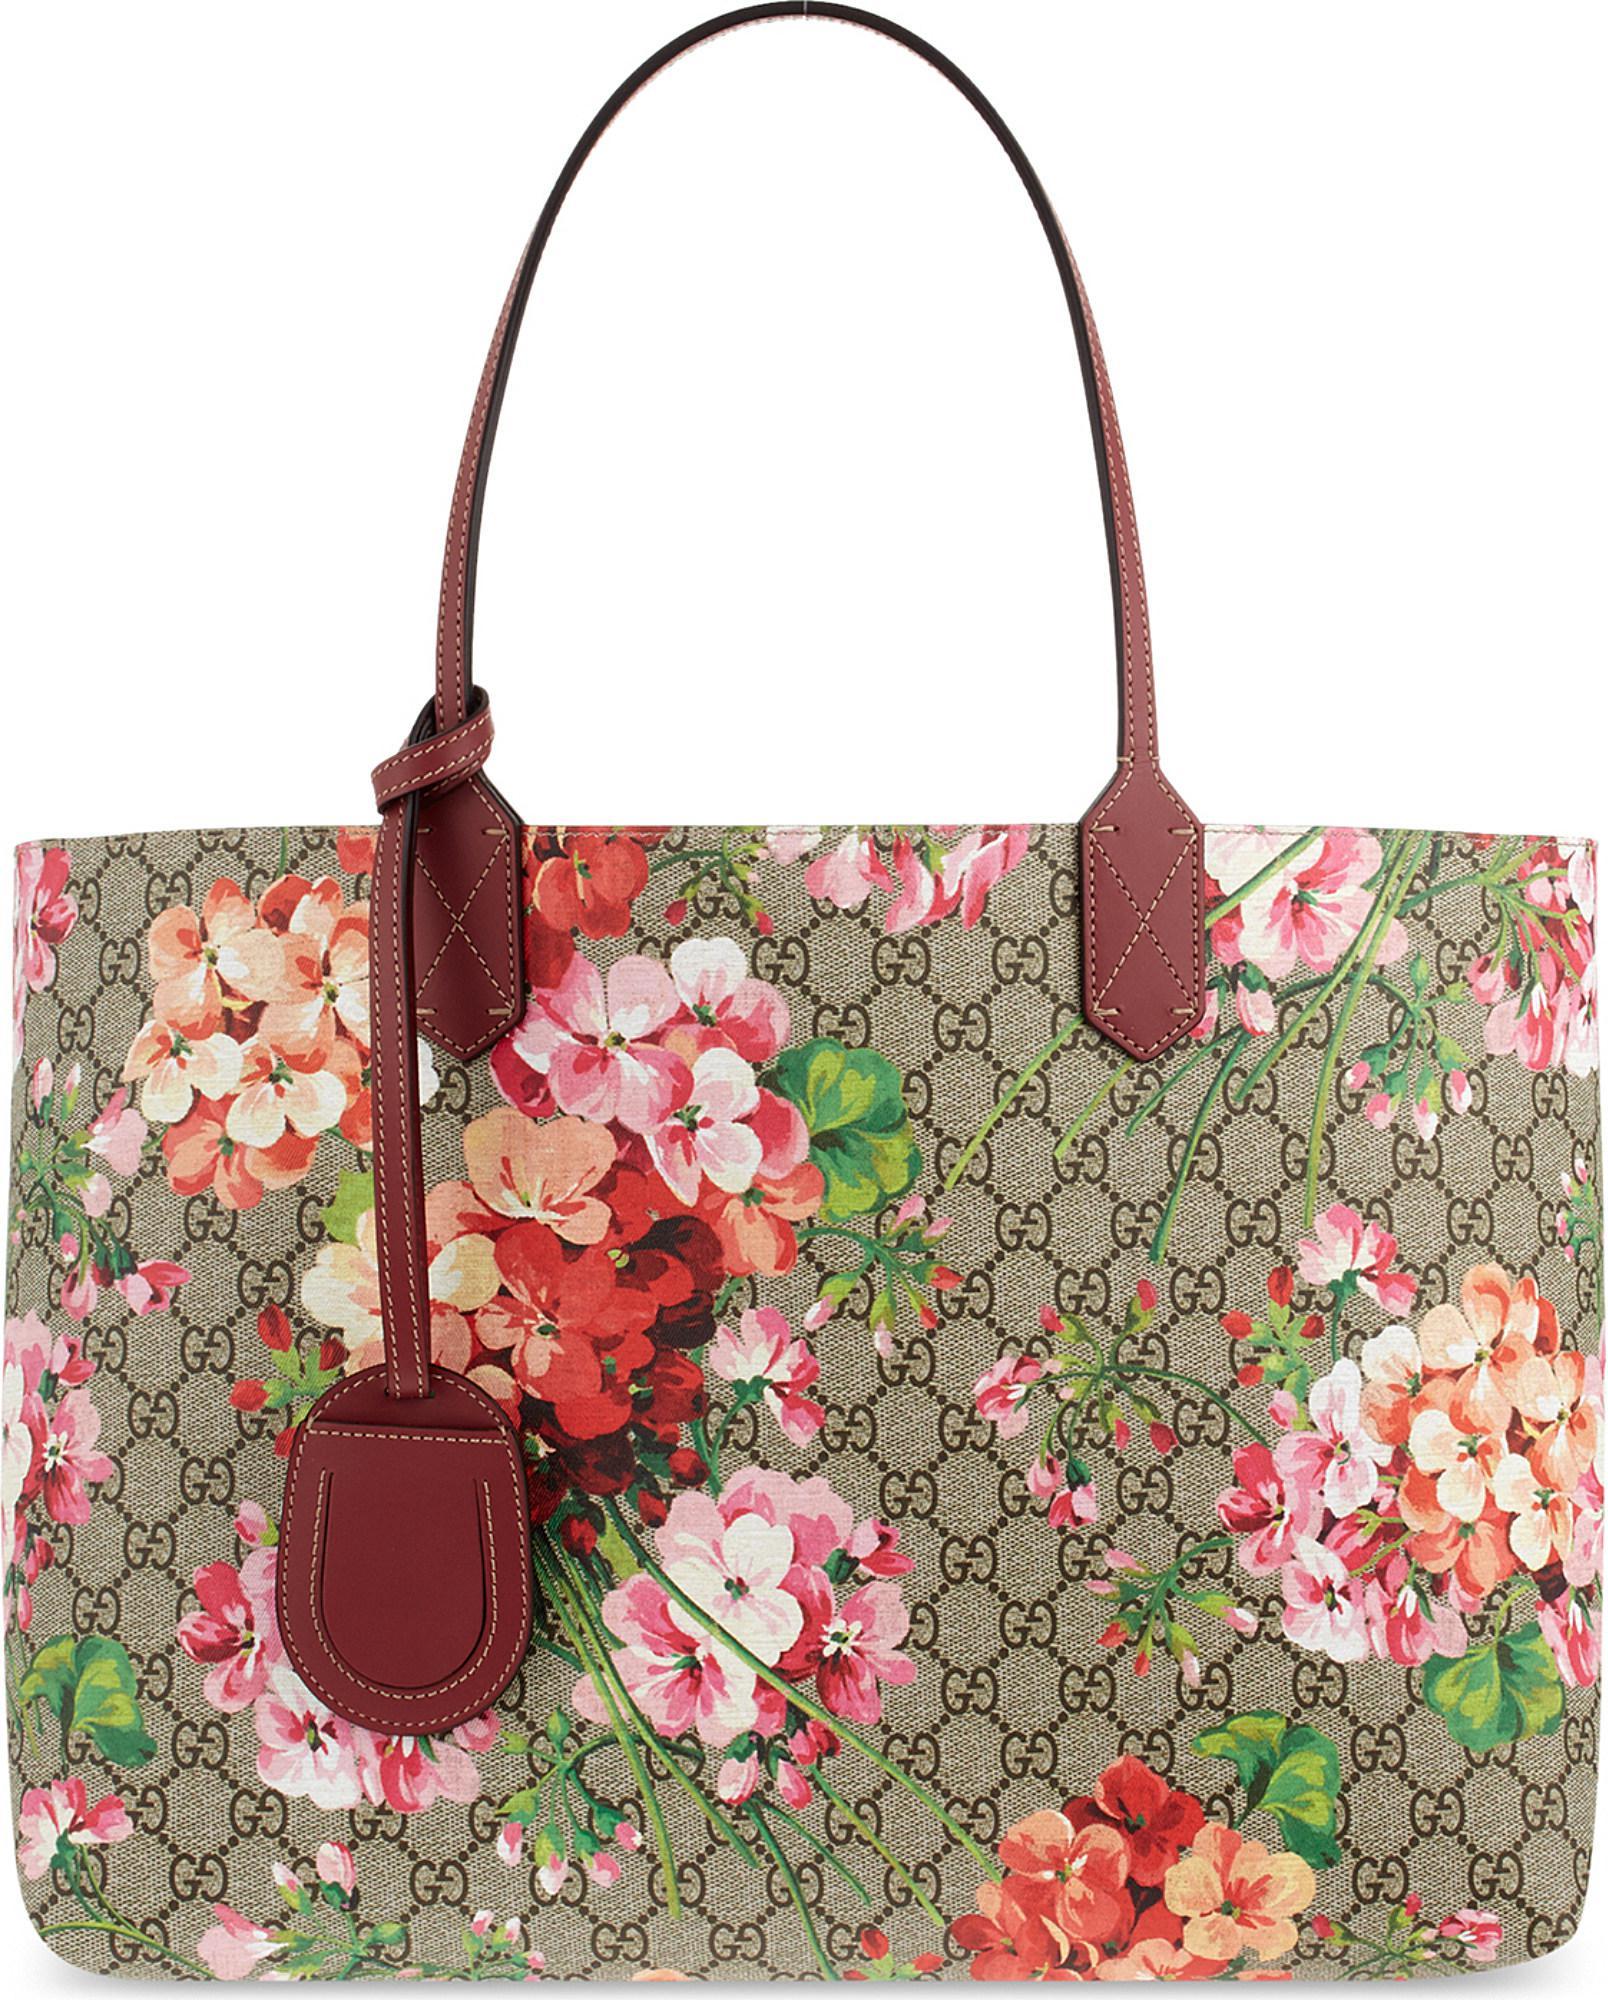 e4a067f39c34 Gucci Reversible Floral Logo Leather Shopper Bag - Lyst